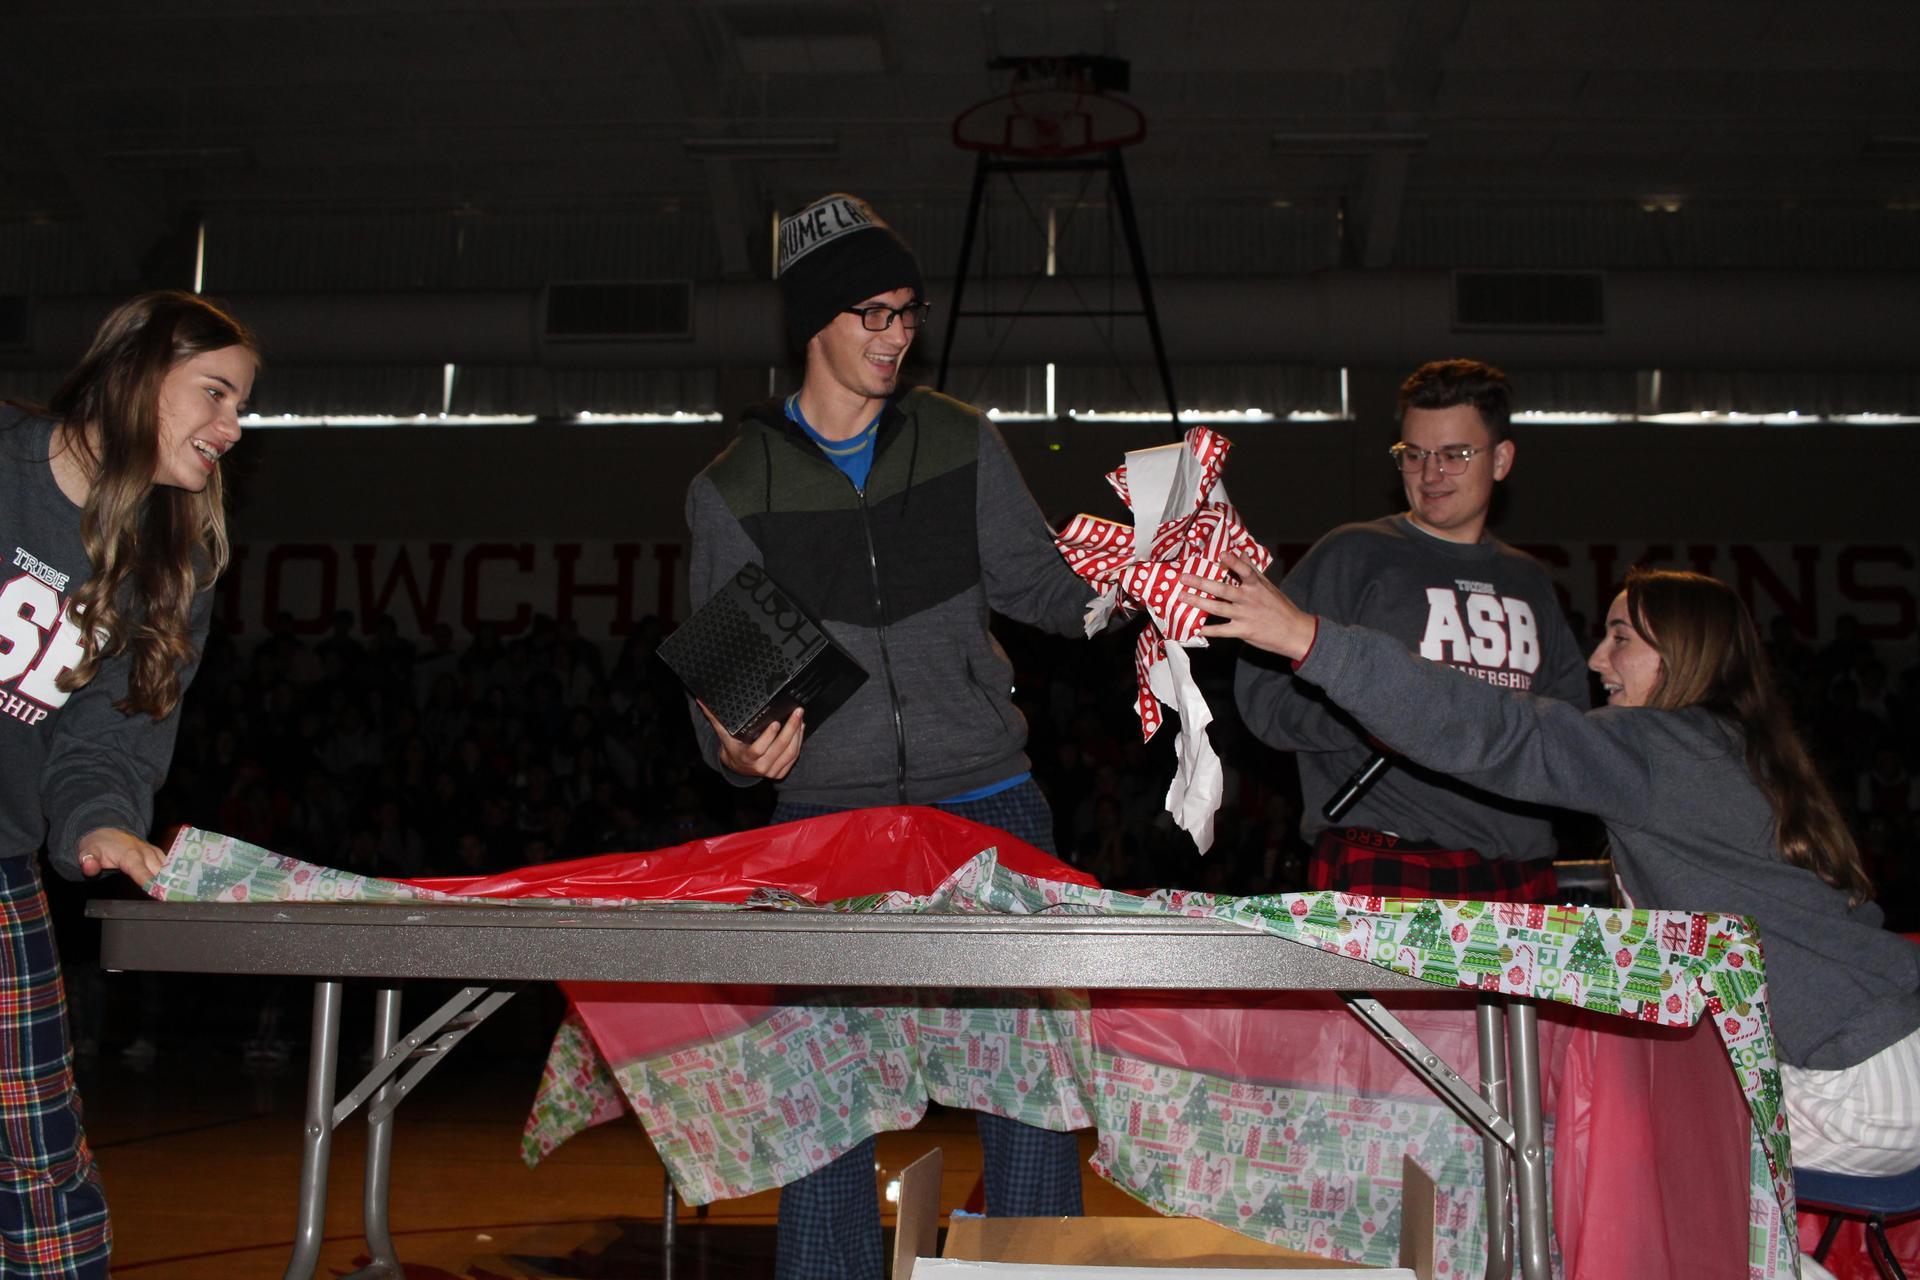 Michael Eggert opening his gift